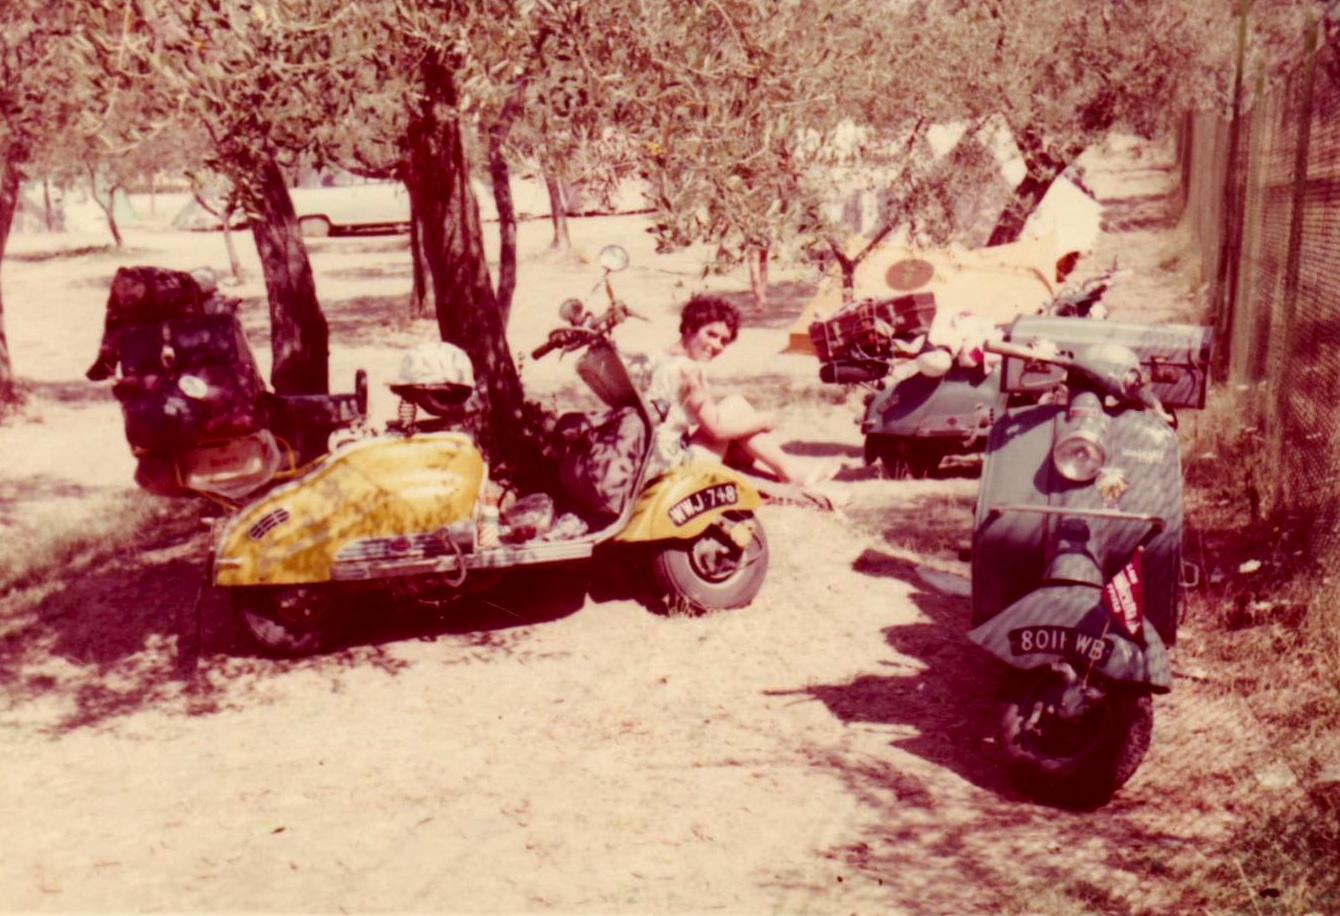 https://orvietoorbust.files.wordpress.com/2012/04/yellow-scooter.jpg